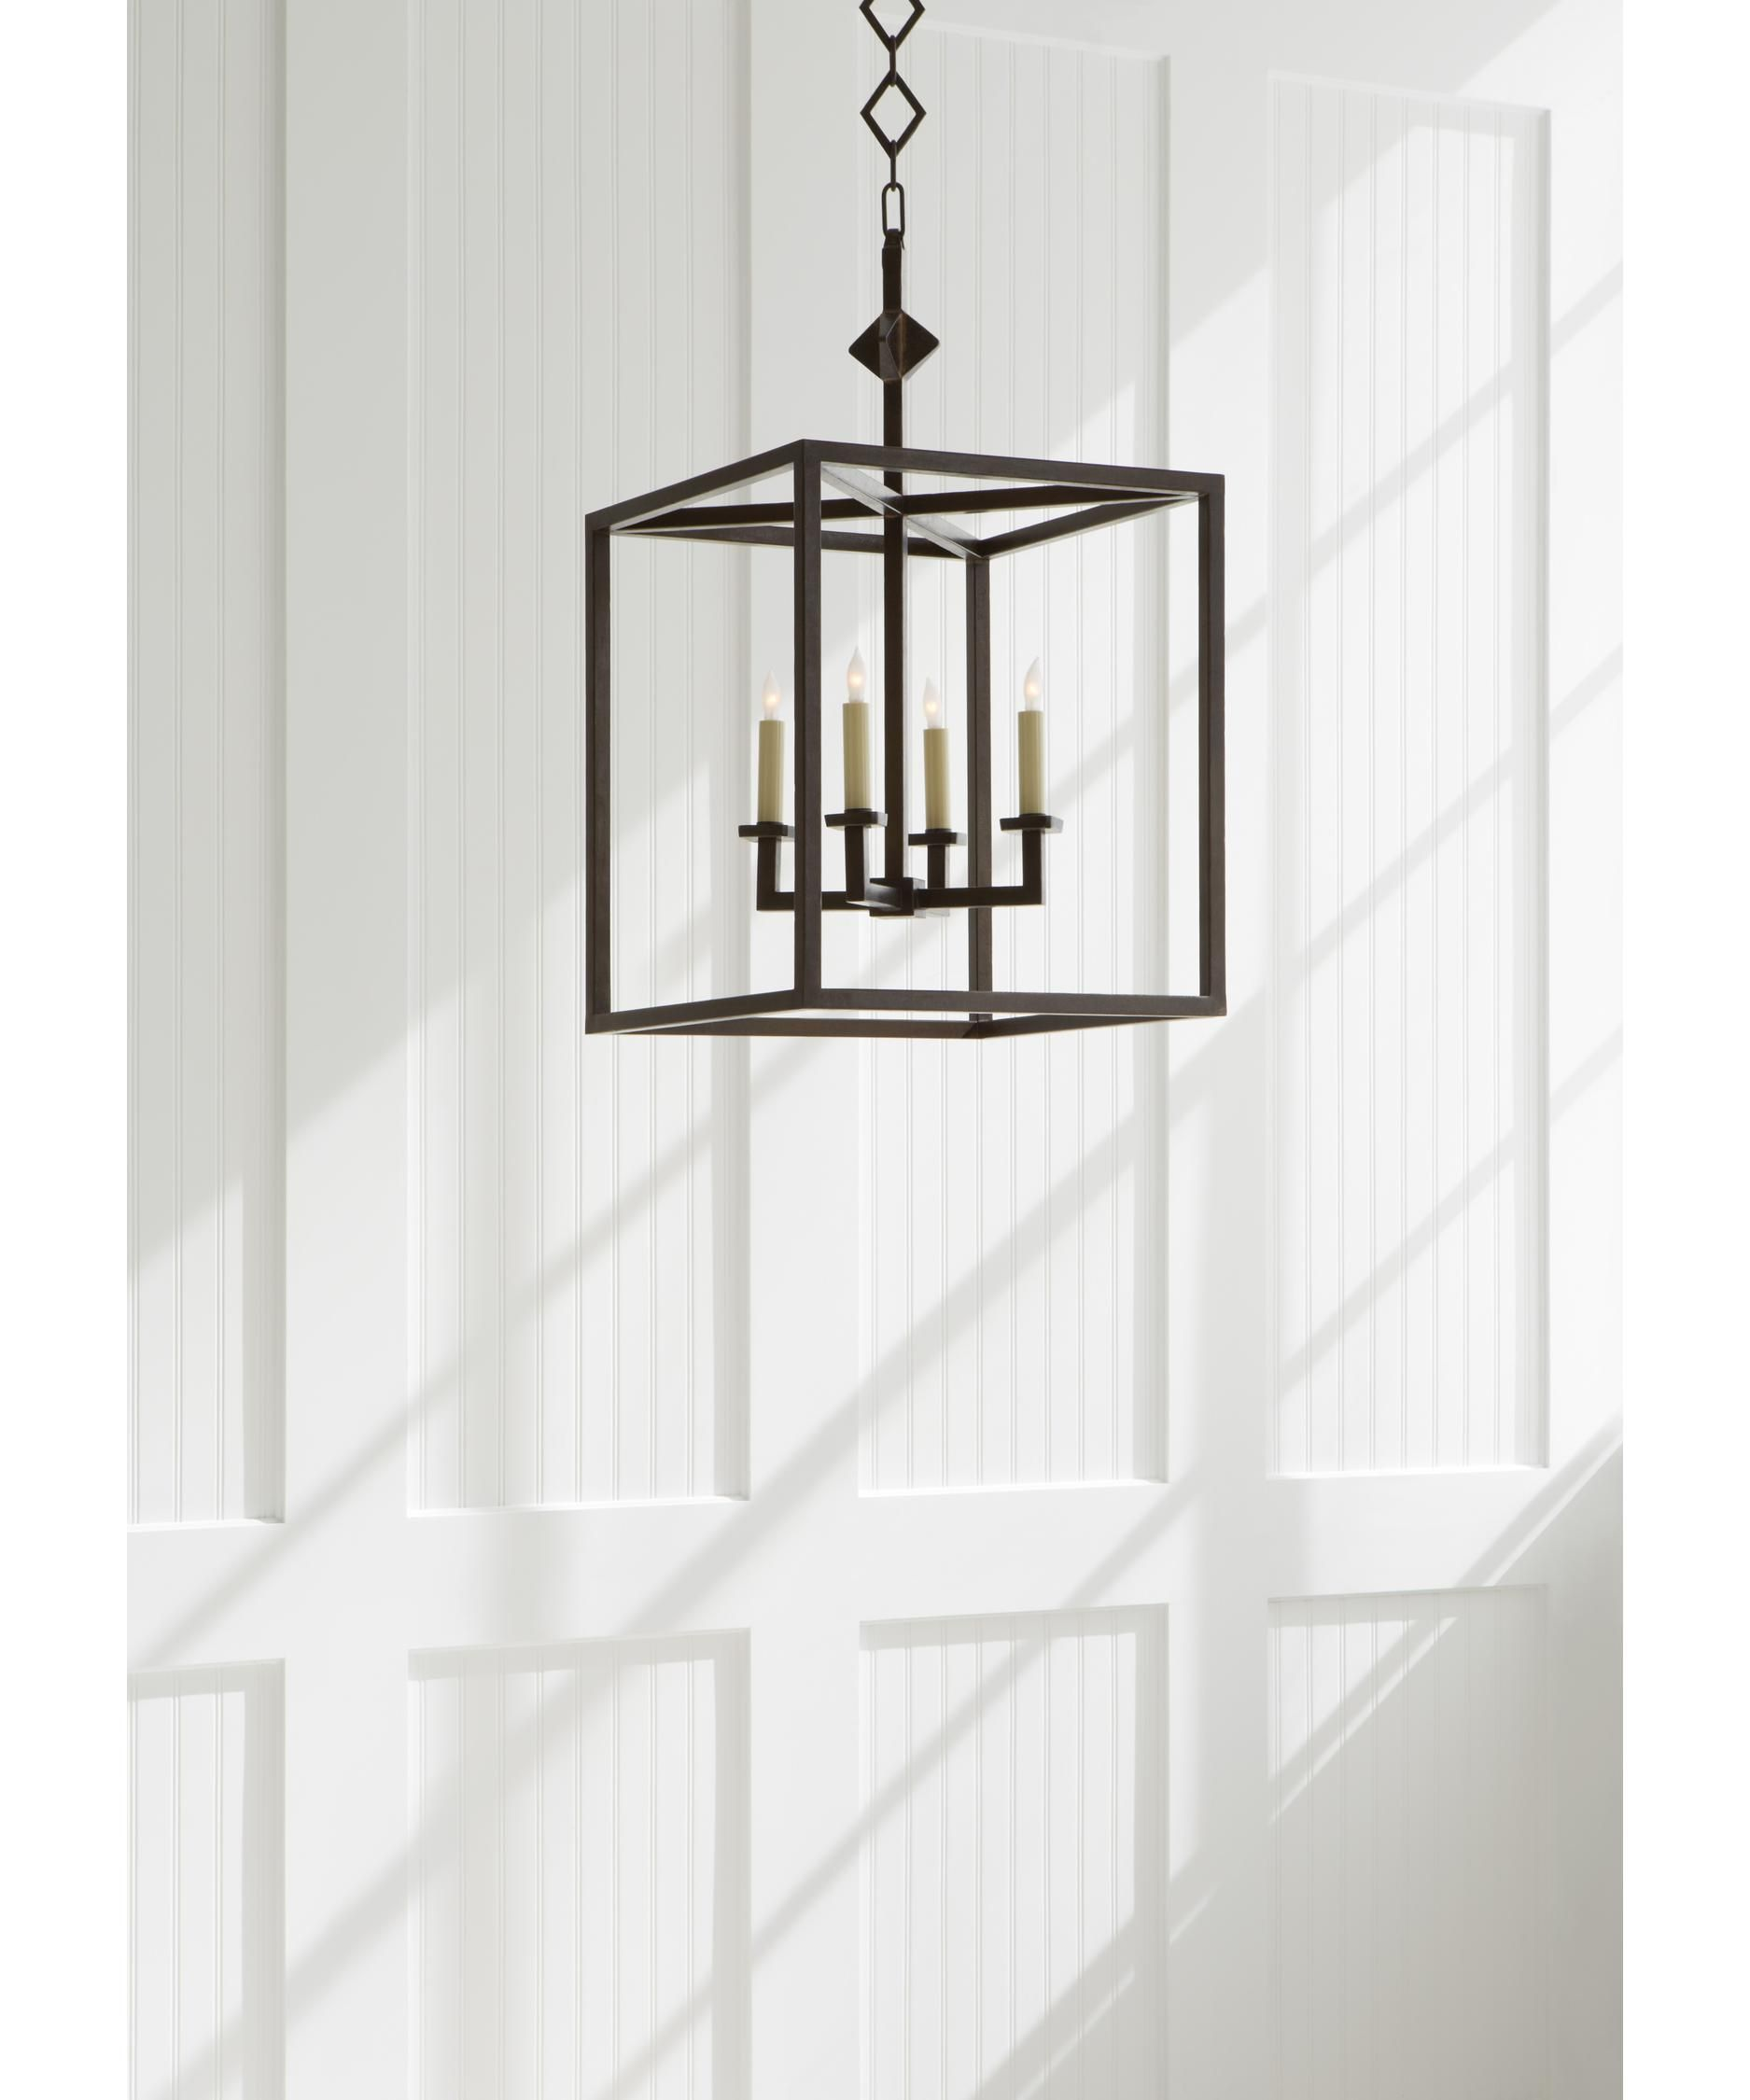 J Randall Powers Interior Design: Pin On Designers: J. Randall Powers